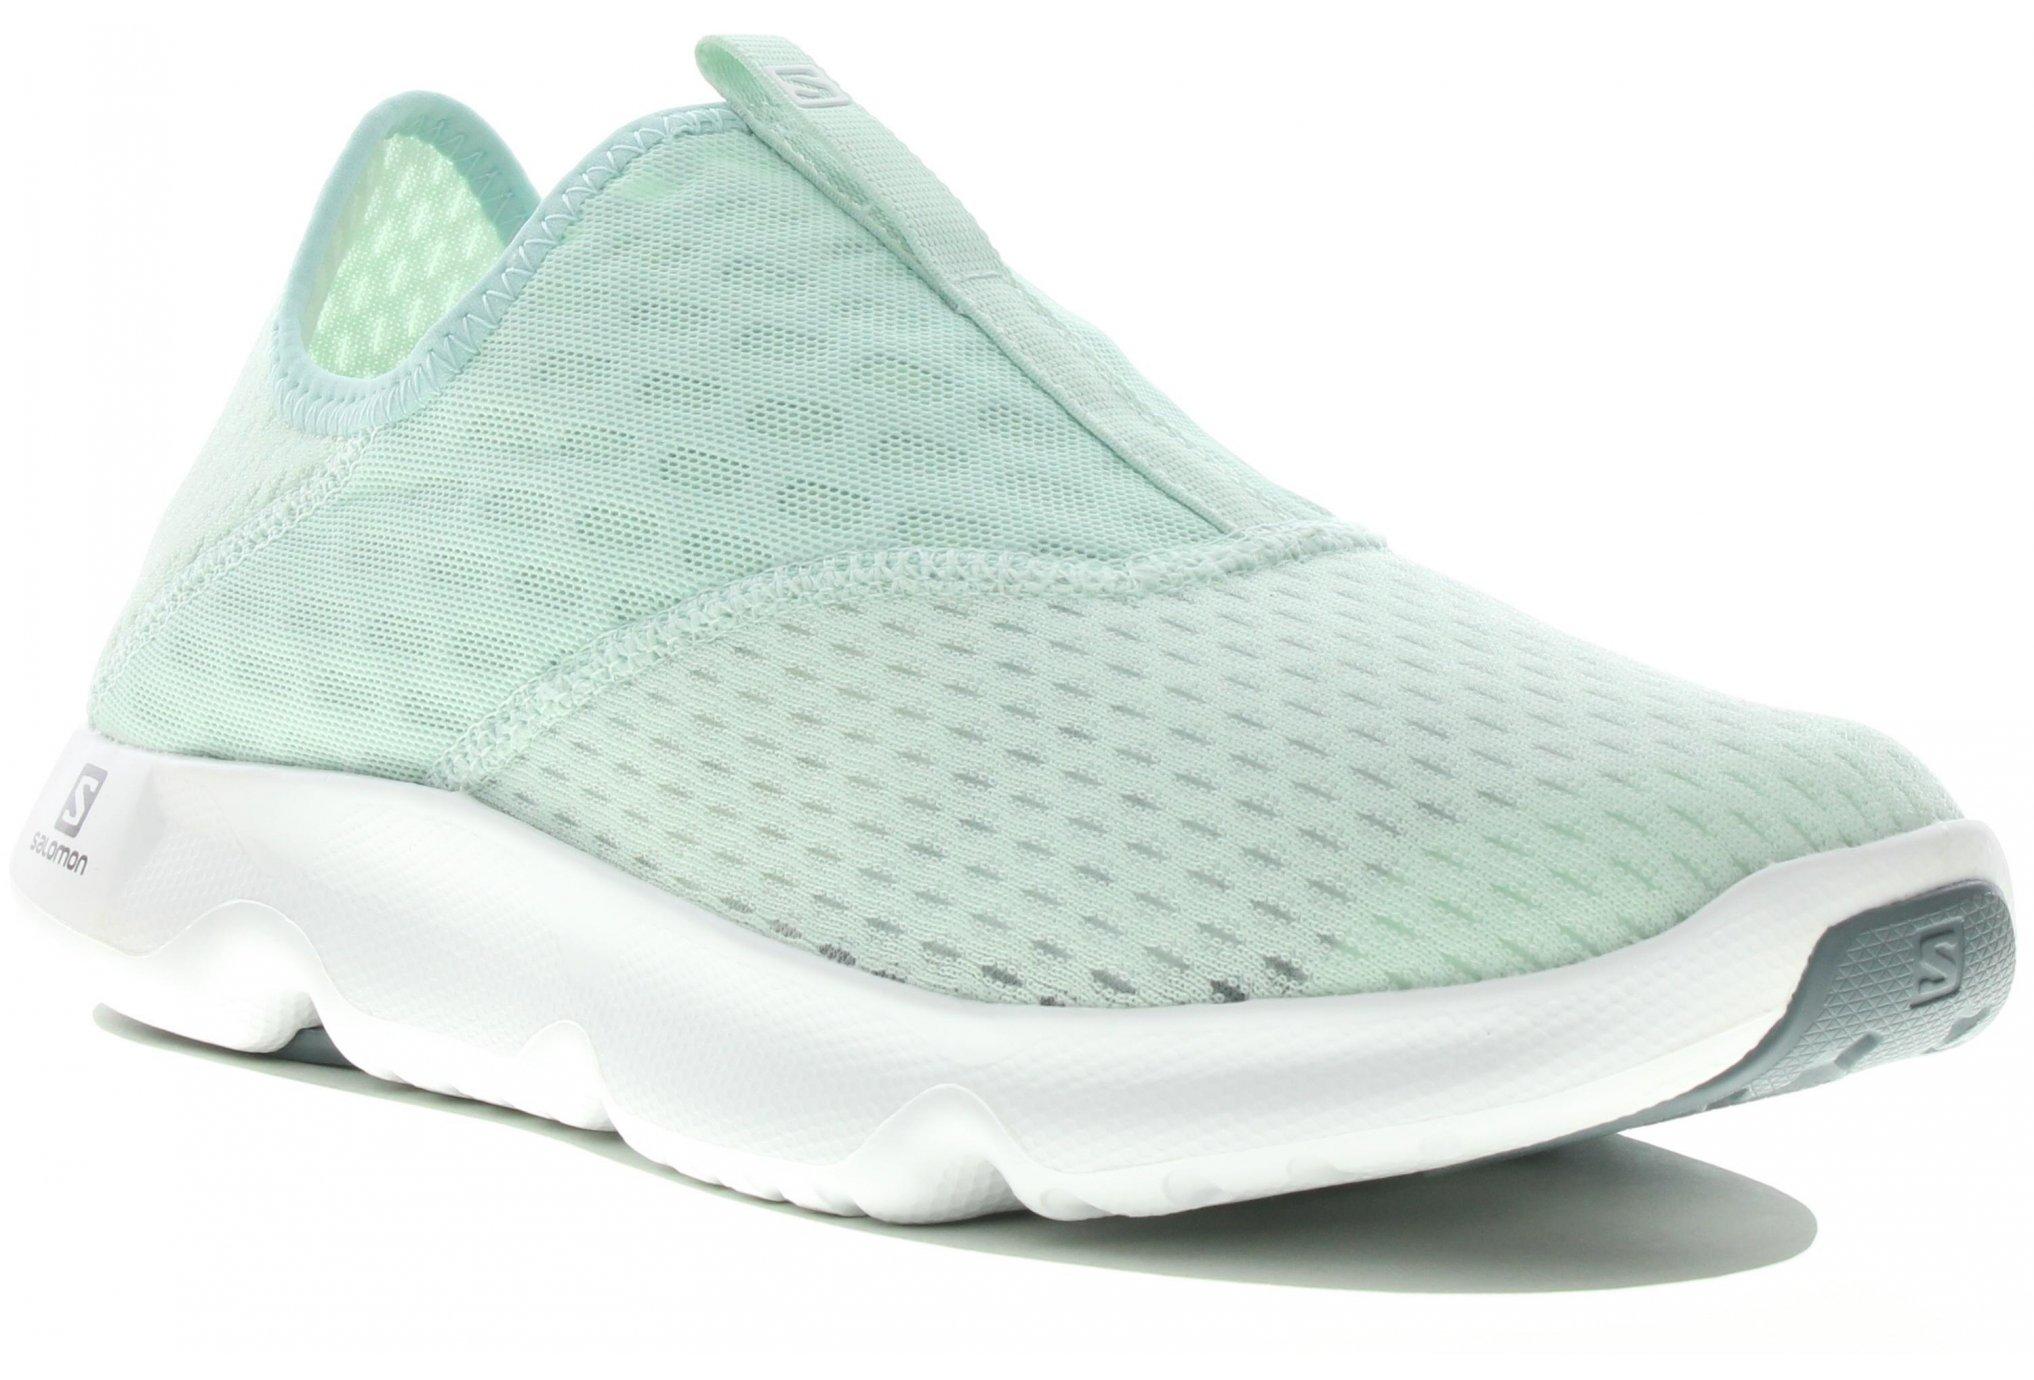 Salomon Reelax Moc 5.0 W Chaussures running femme